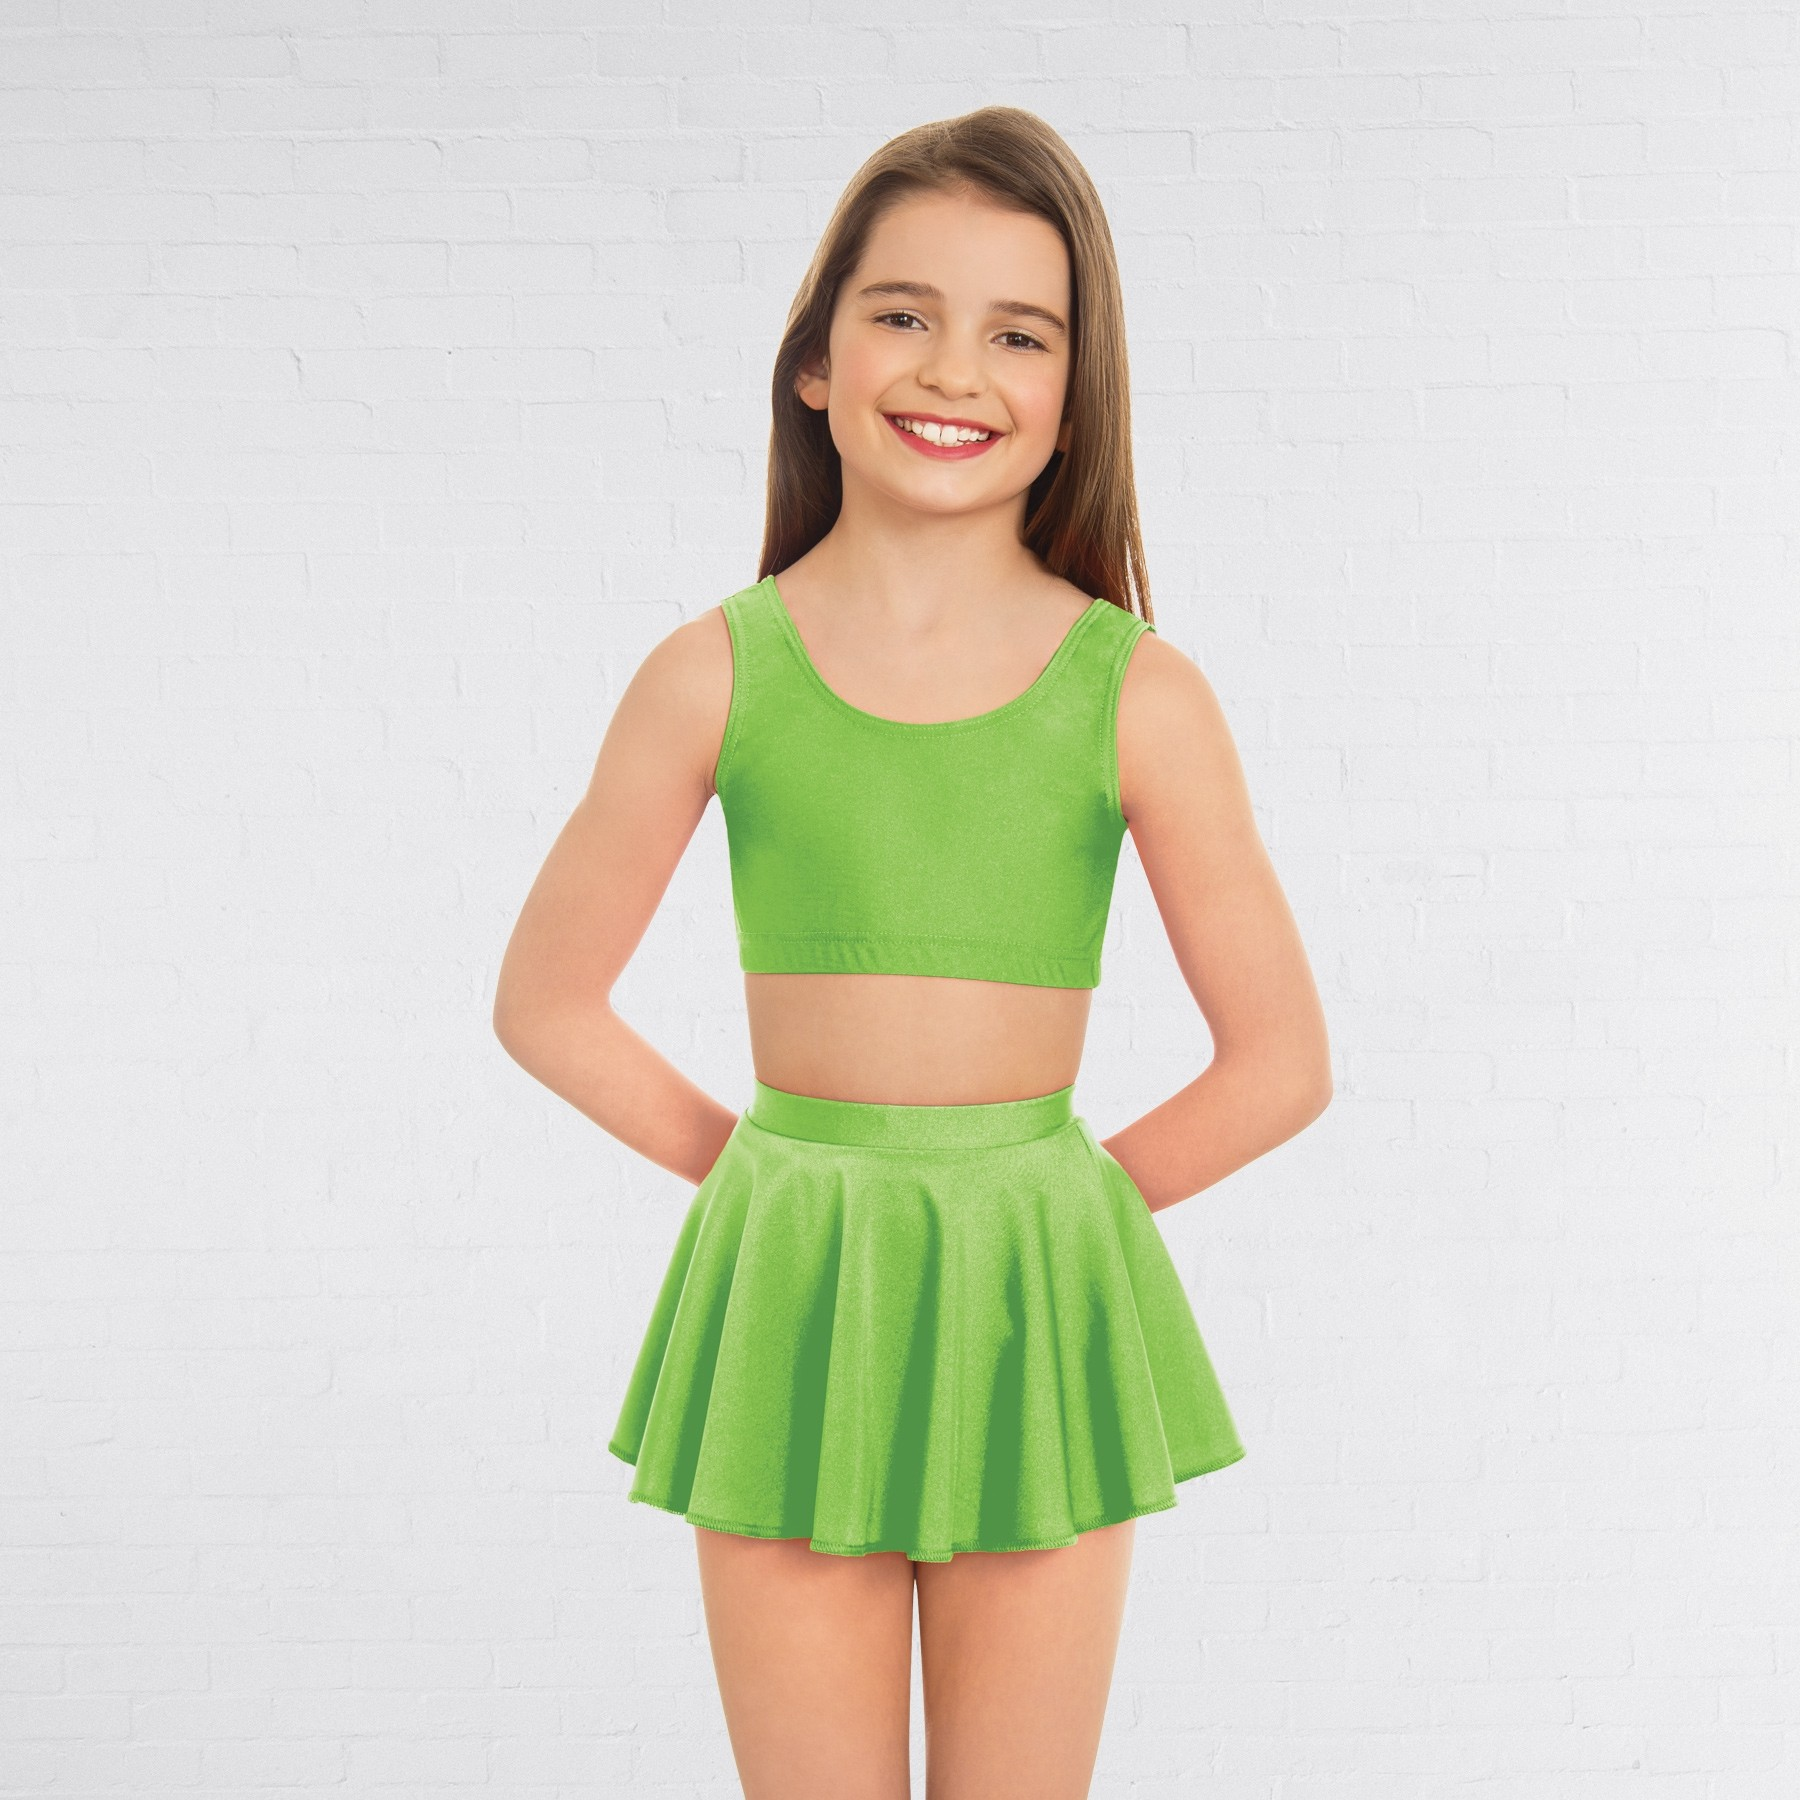 1st Position Circular Skirt (Flo Green)